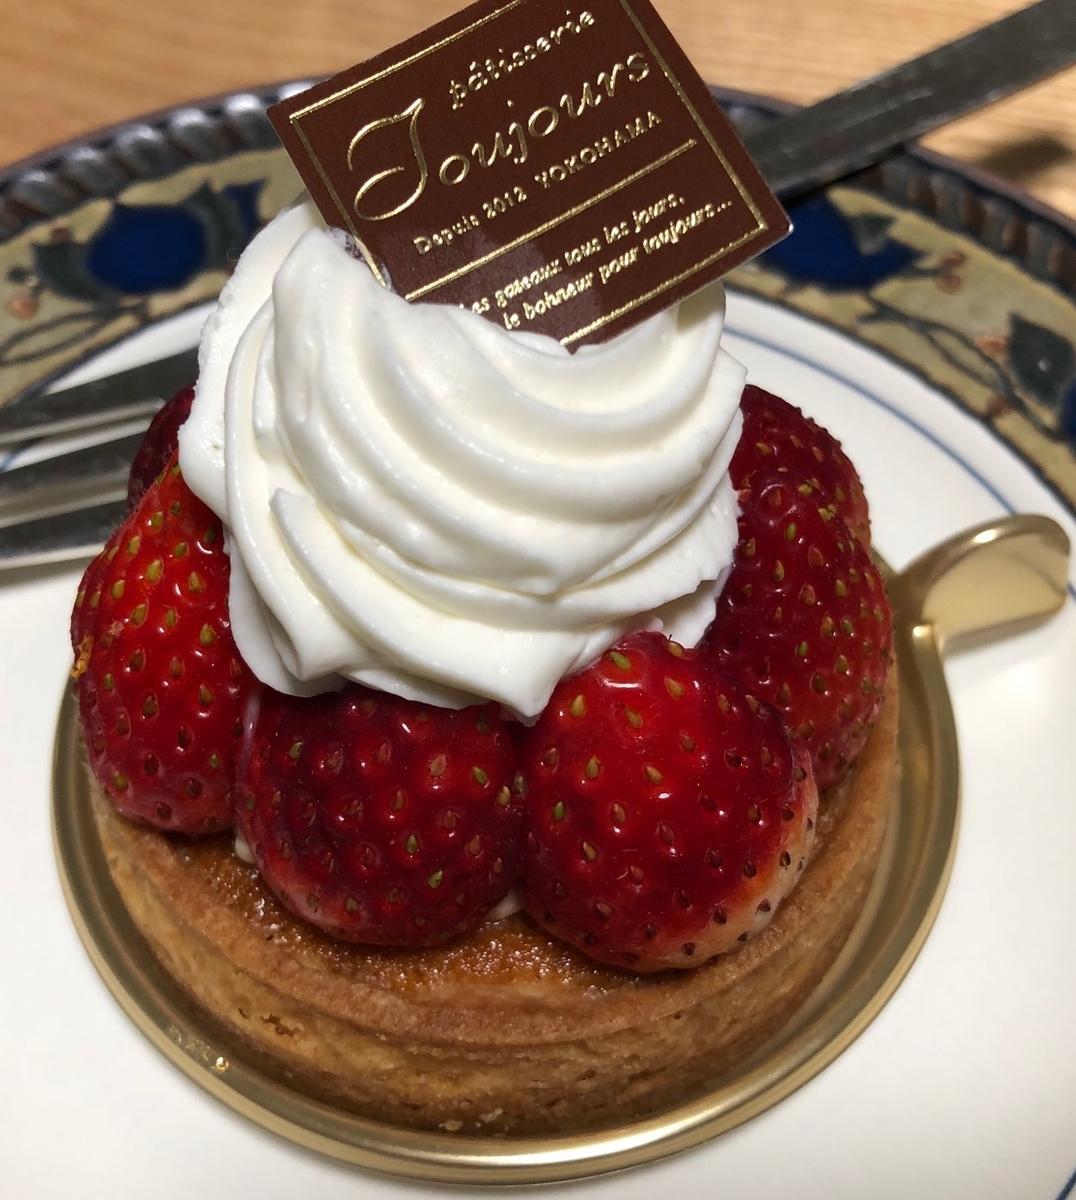 f:id:Strawberry-parfait:20200417214158j:plain